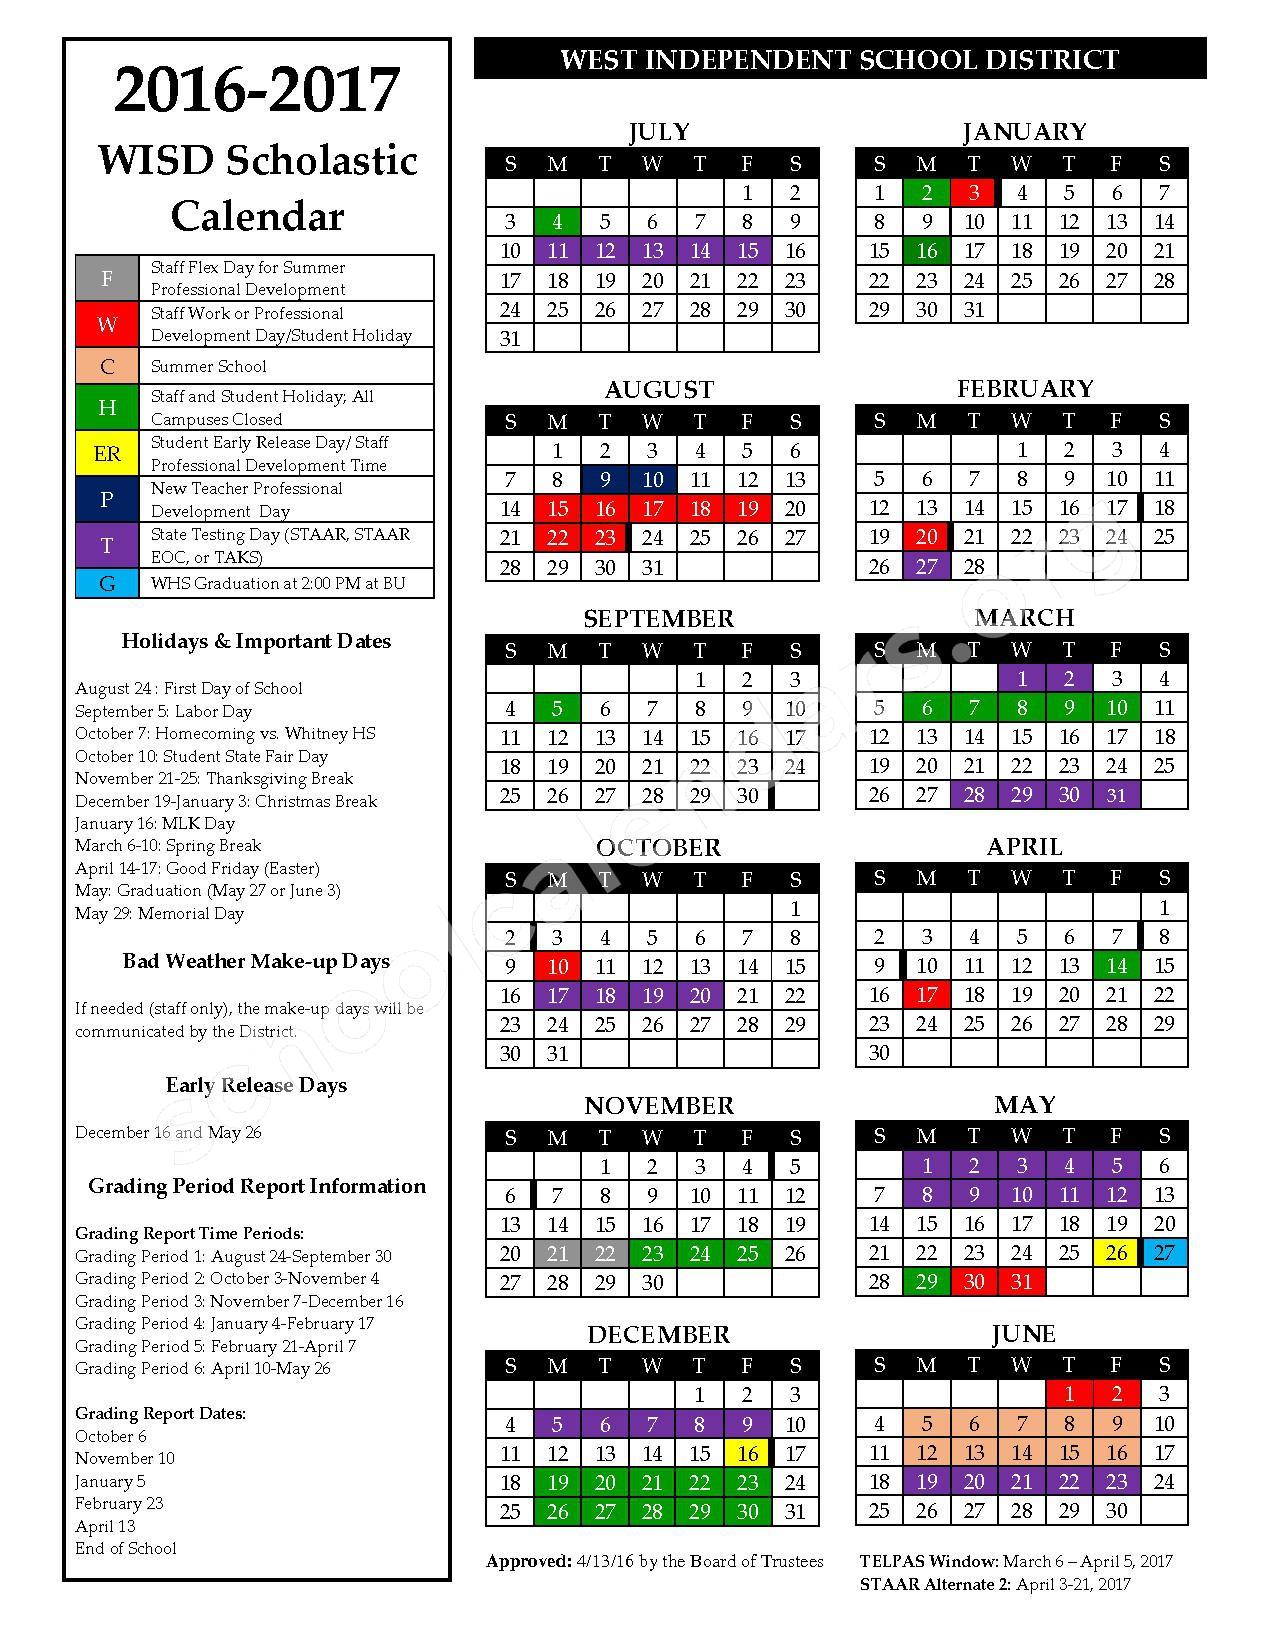 2016 - 2017 School Calendar – West Independent School District – page 1